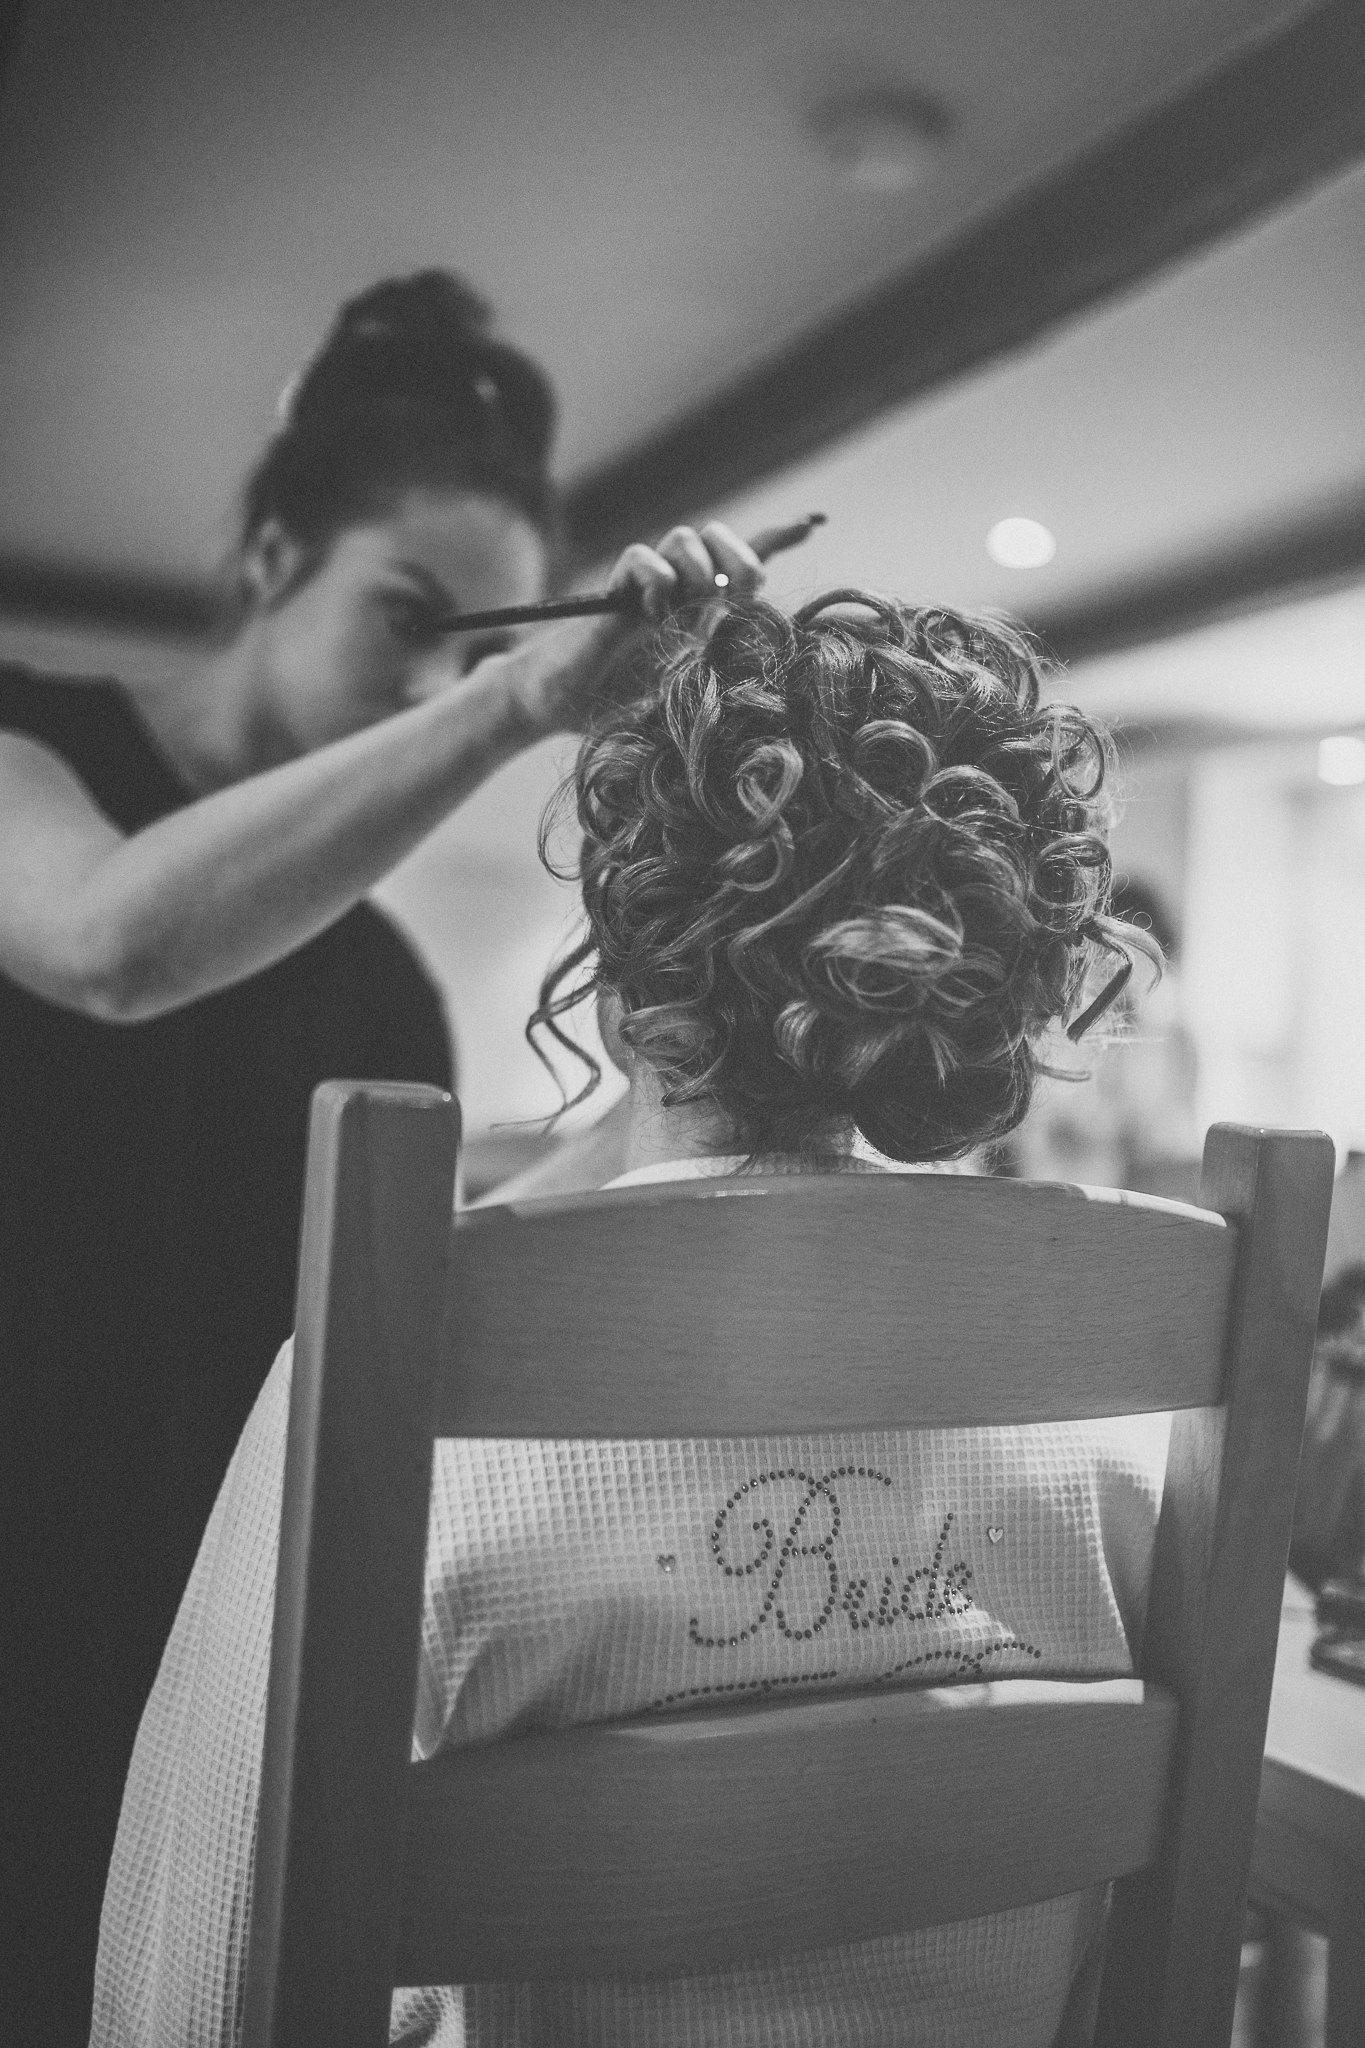 Lancashire-Creative-natural-documentary-wedding-photography-90002